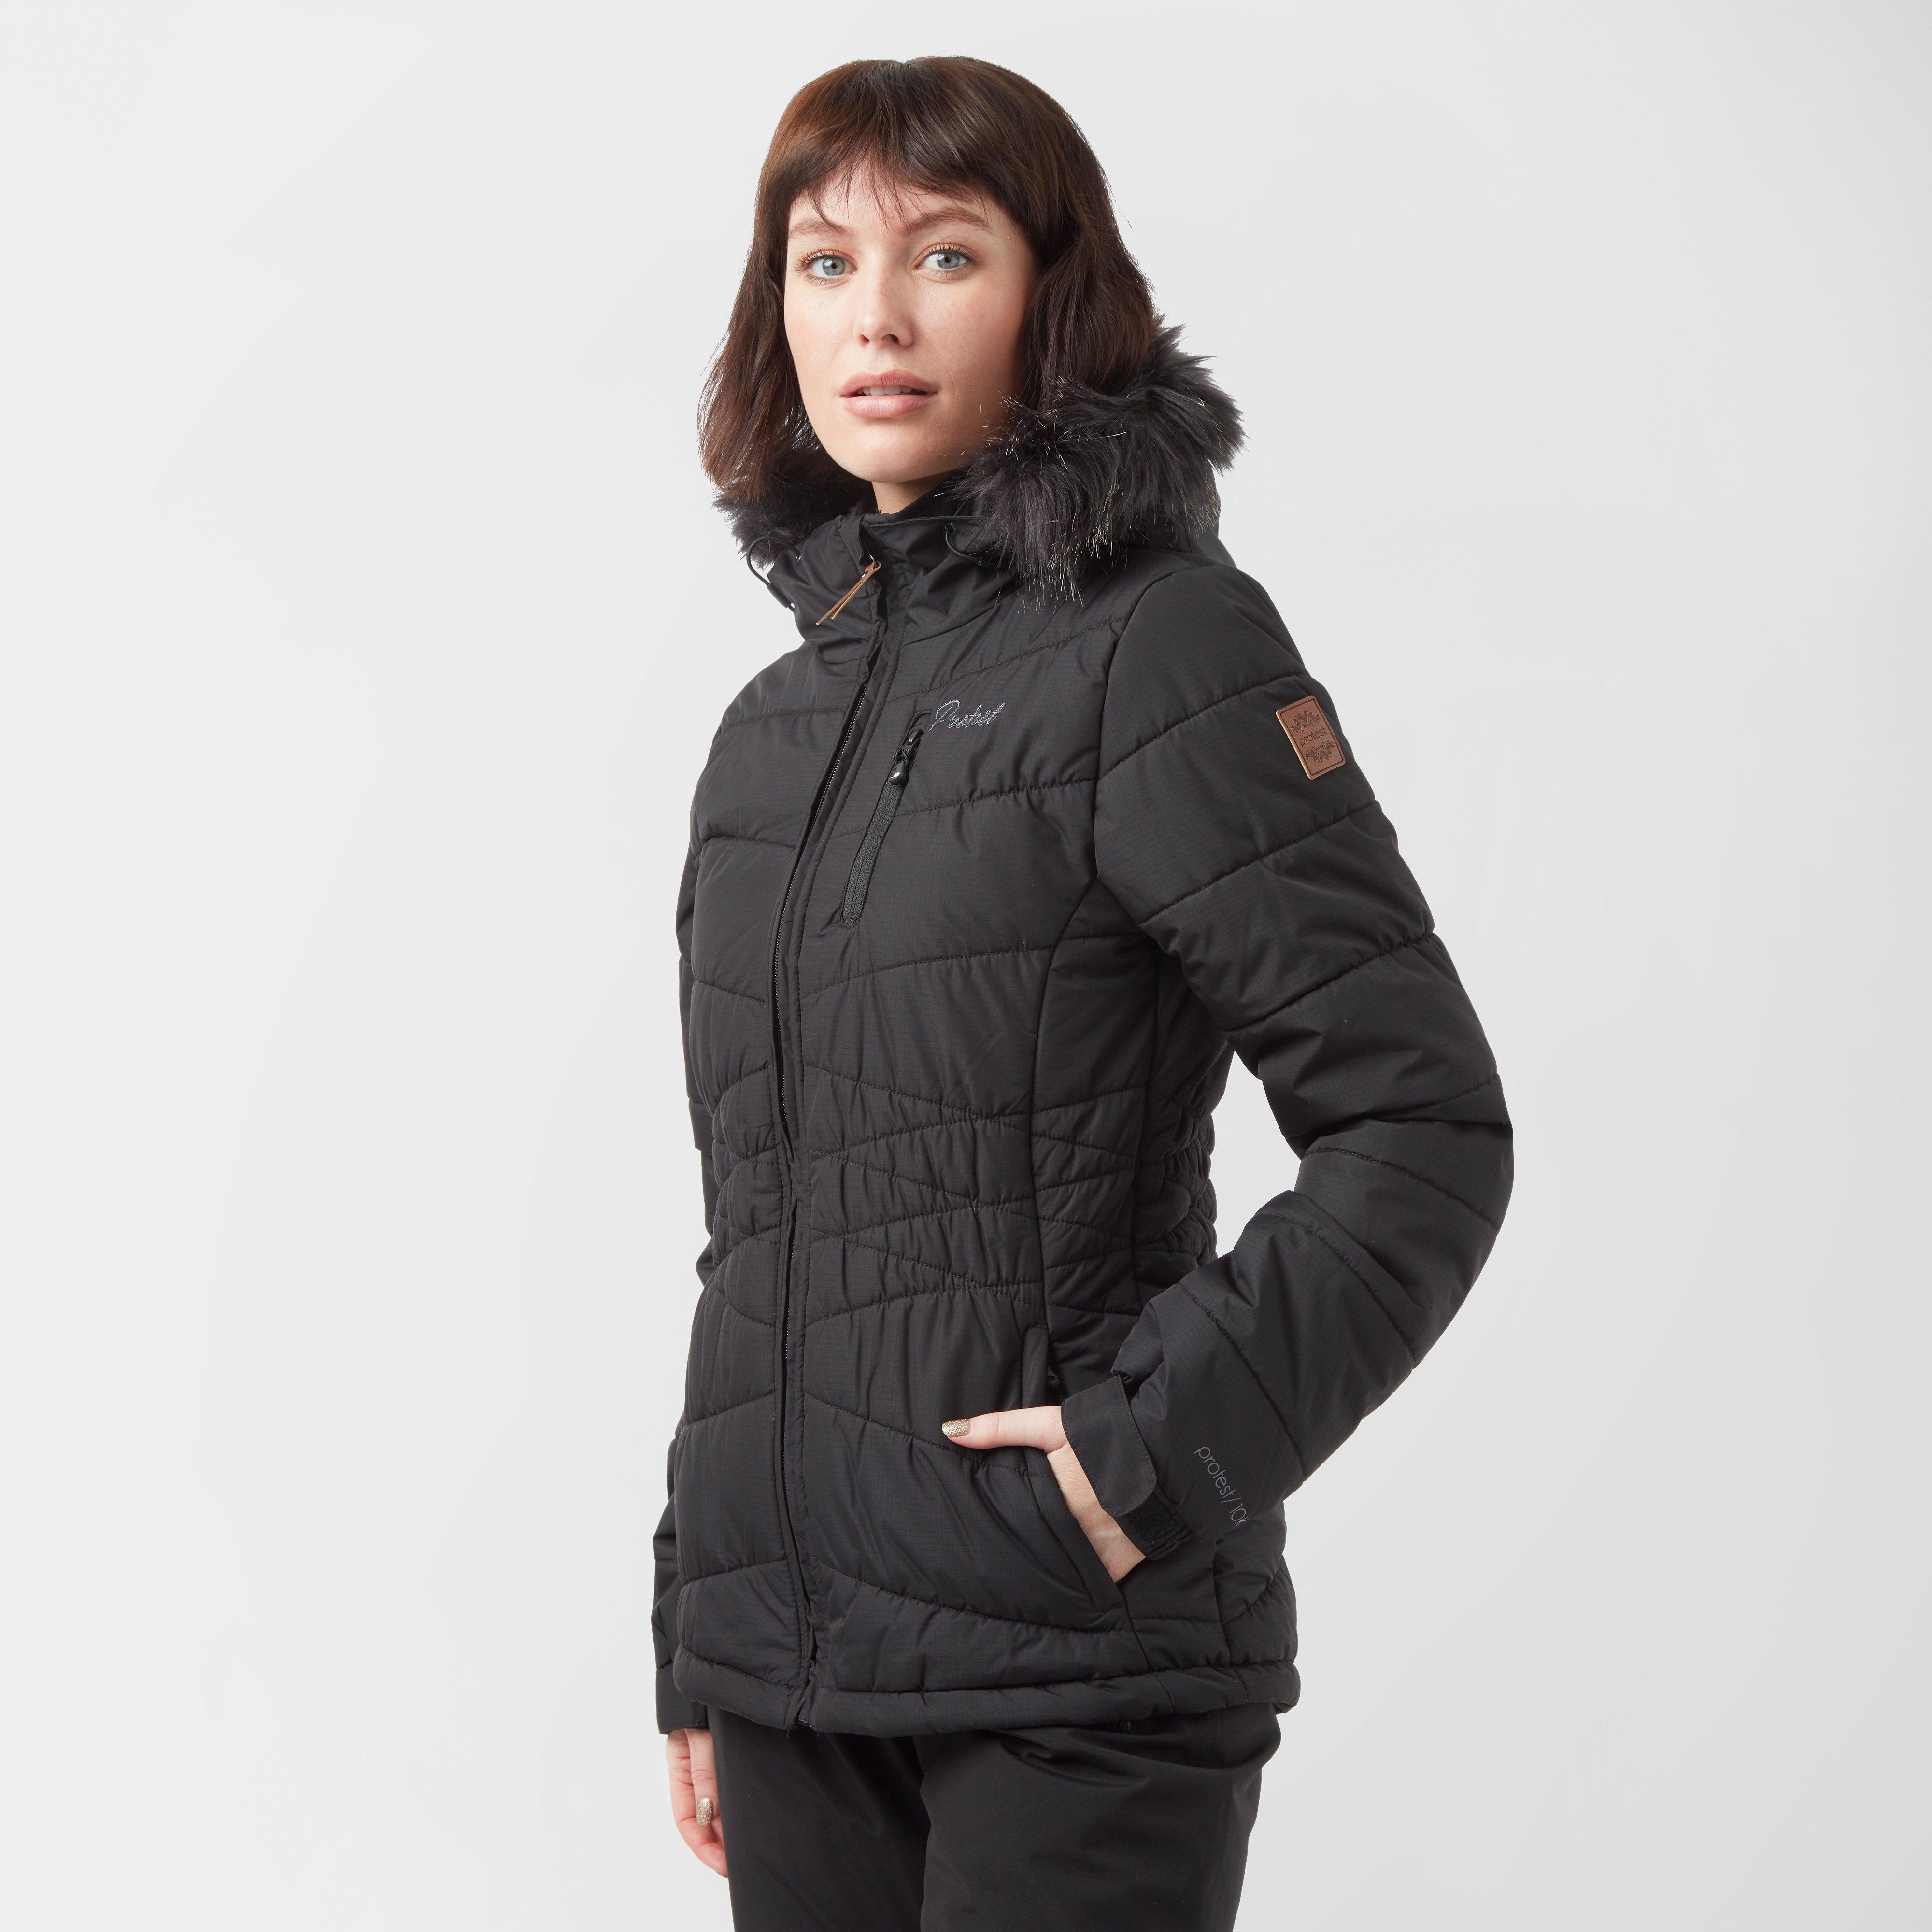 Protest Women's Valdez Snow Jacket, Black